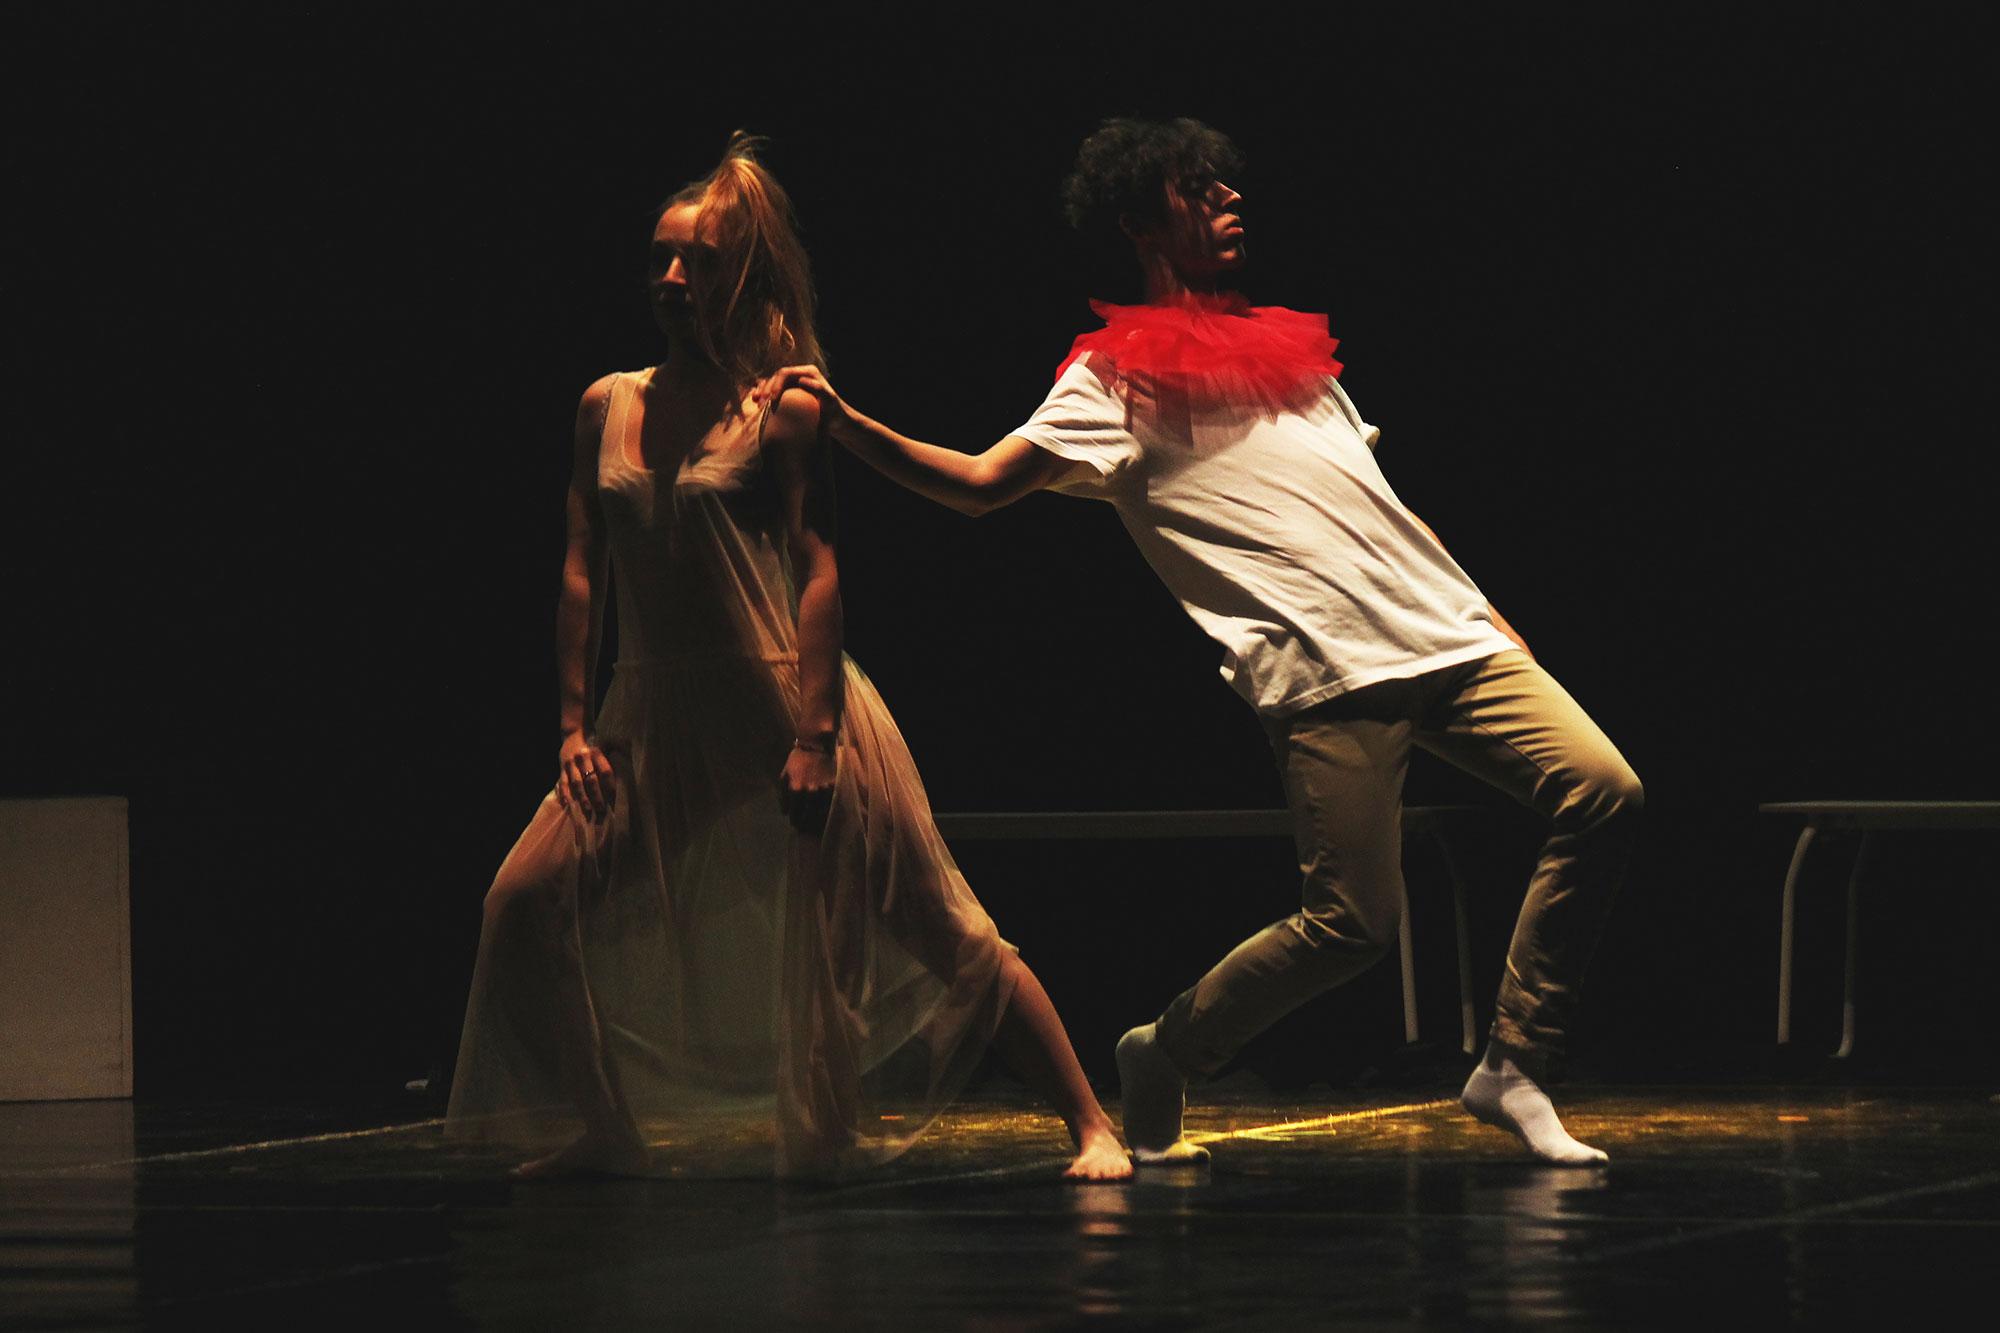 Round Trip | Teatro Binario 7 - Monza_19